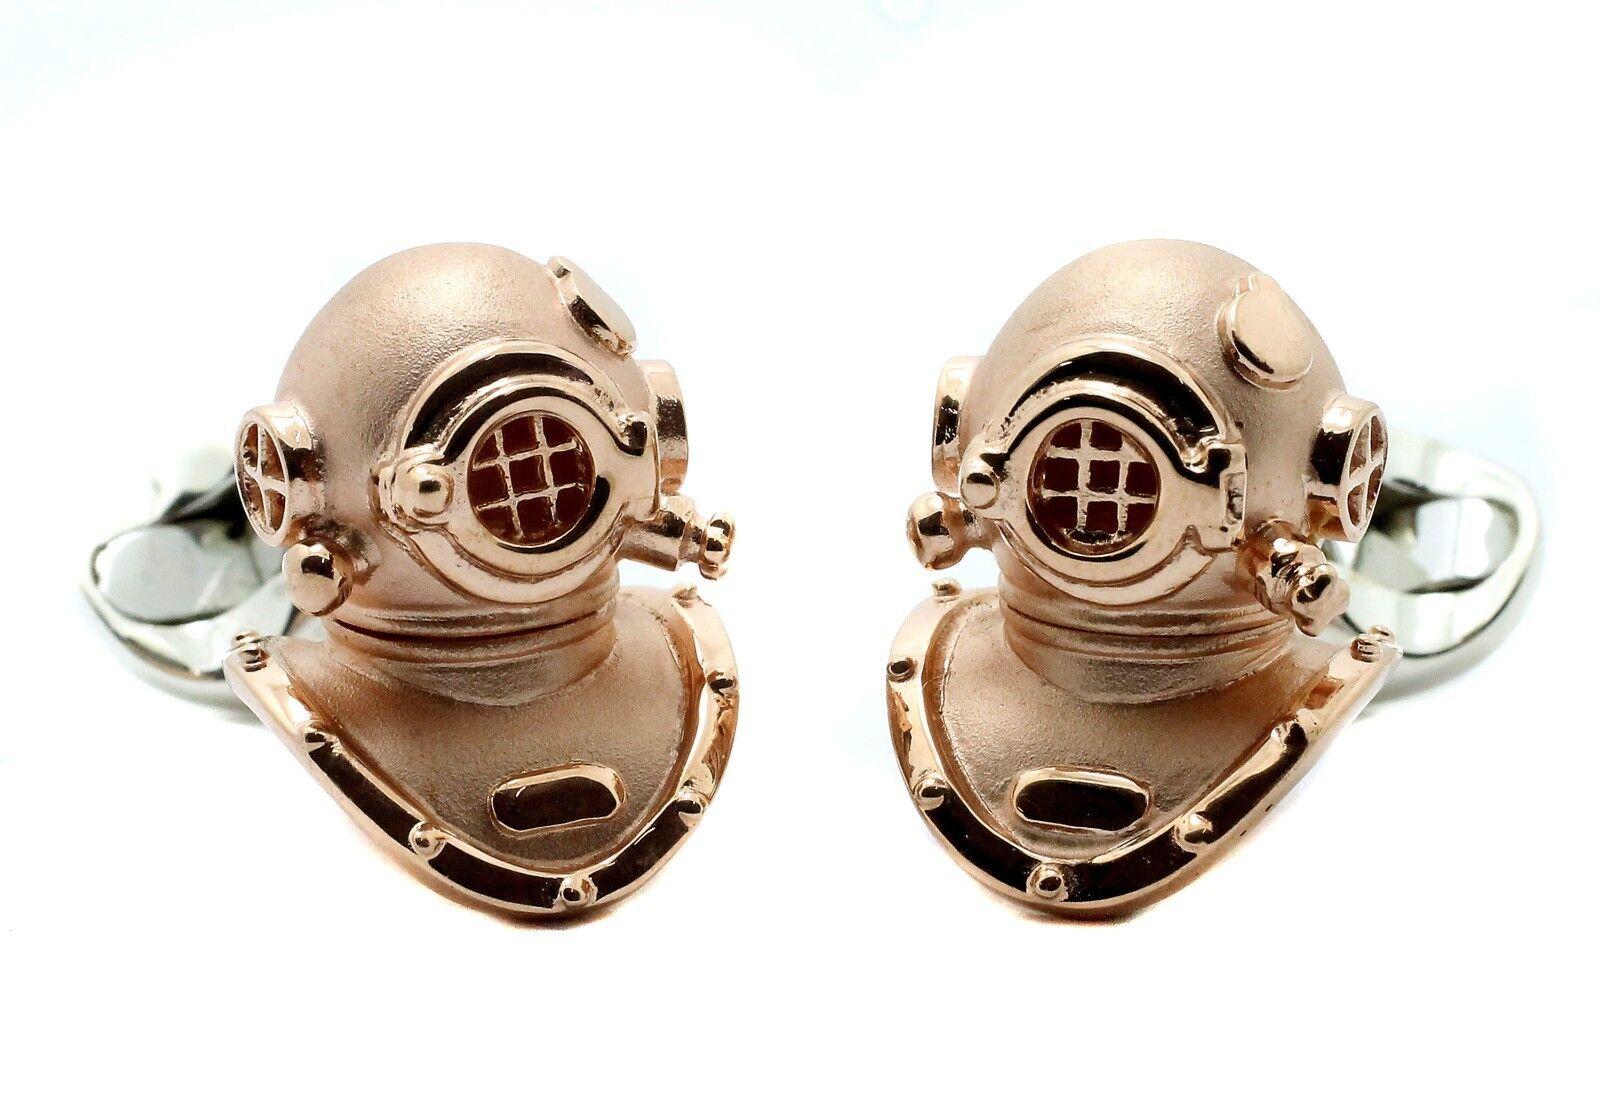 Deakin e Francis argentoo argentoo argentoo Sterling Casco da immersione Gemelli Placcati in oro rosa 2c1913